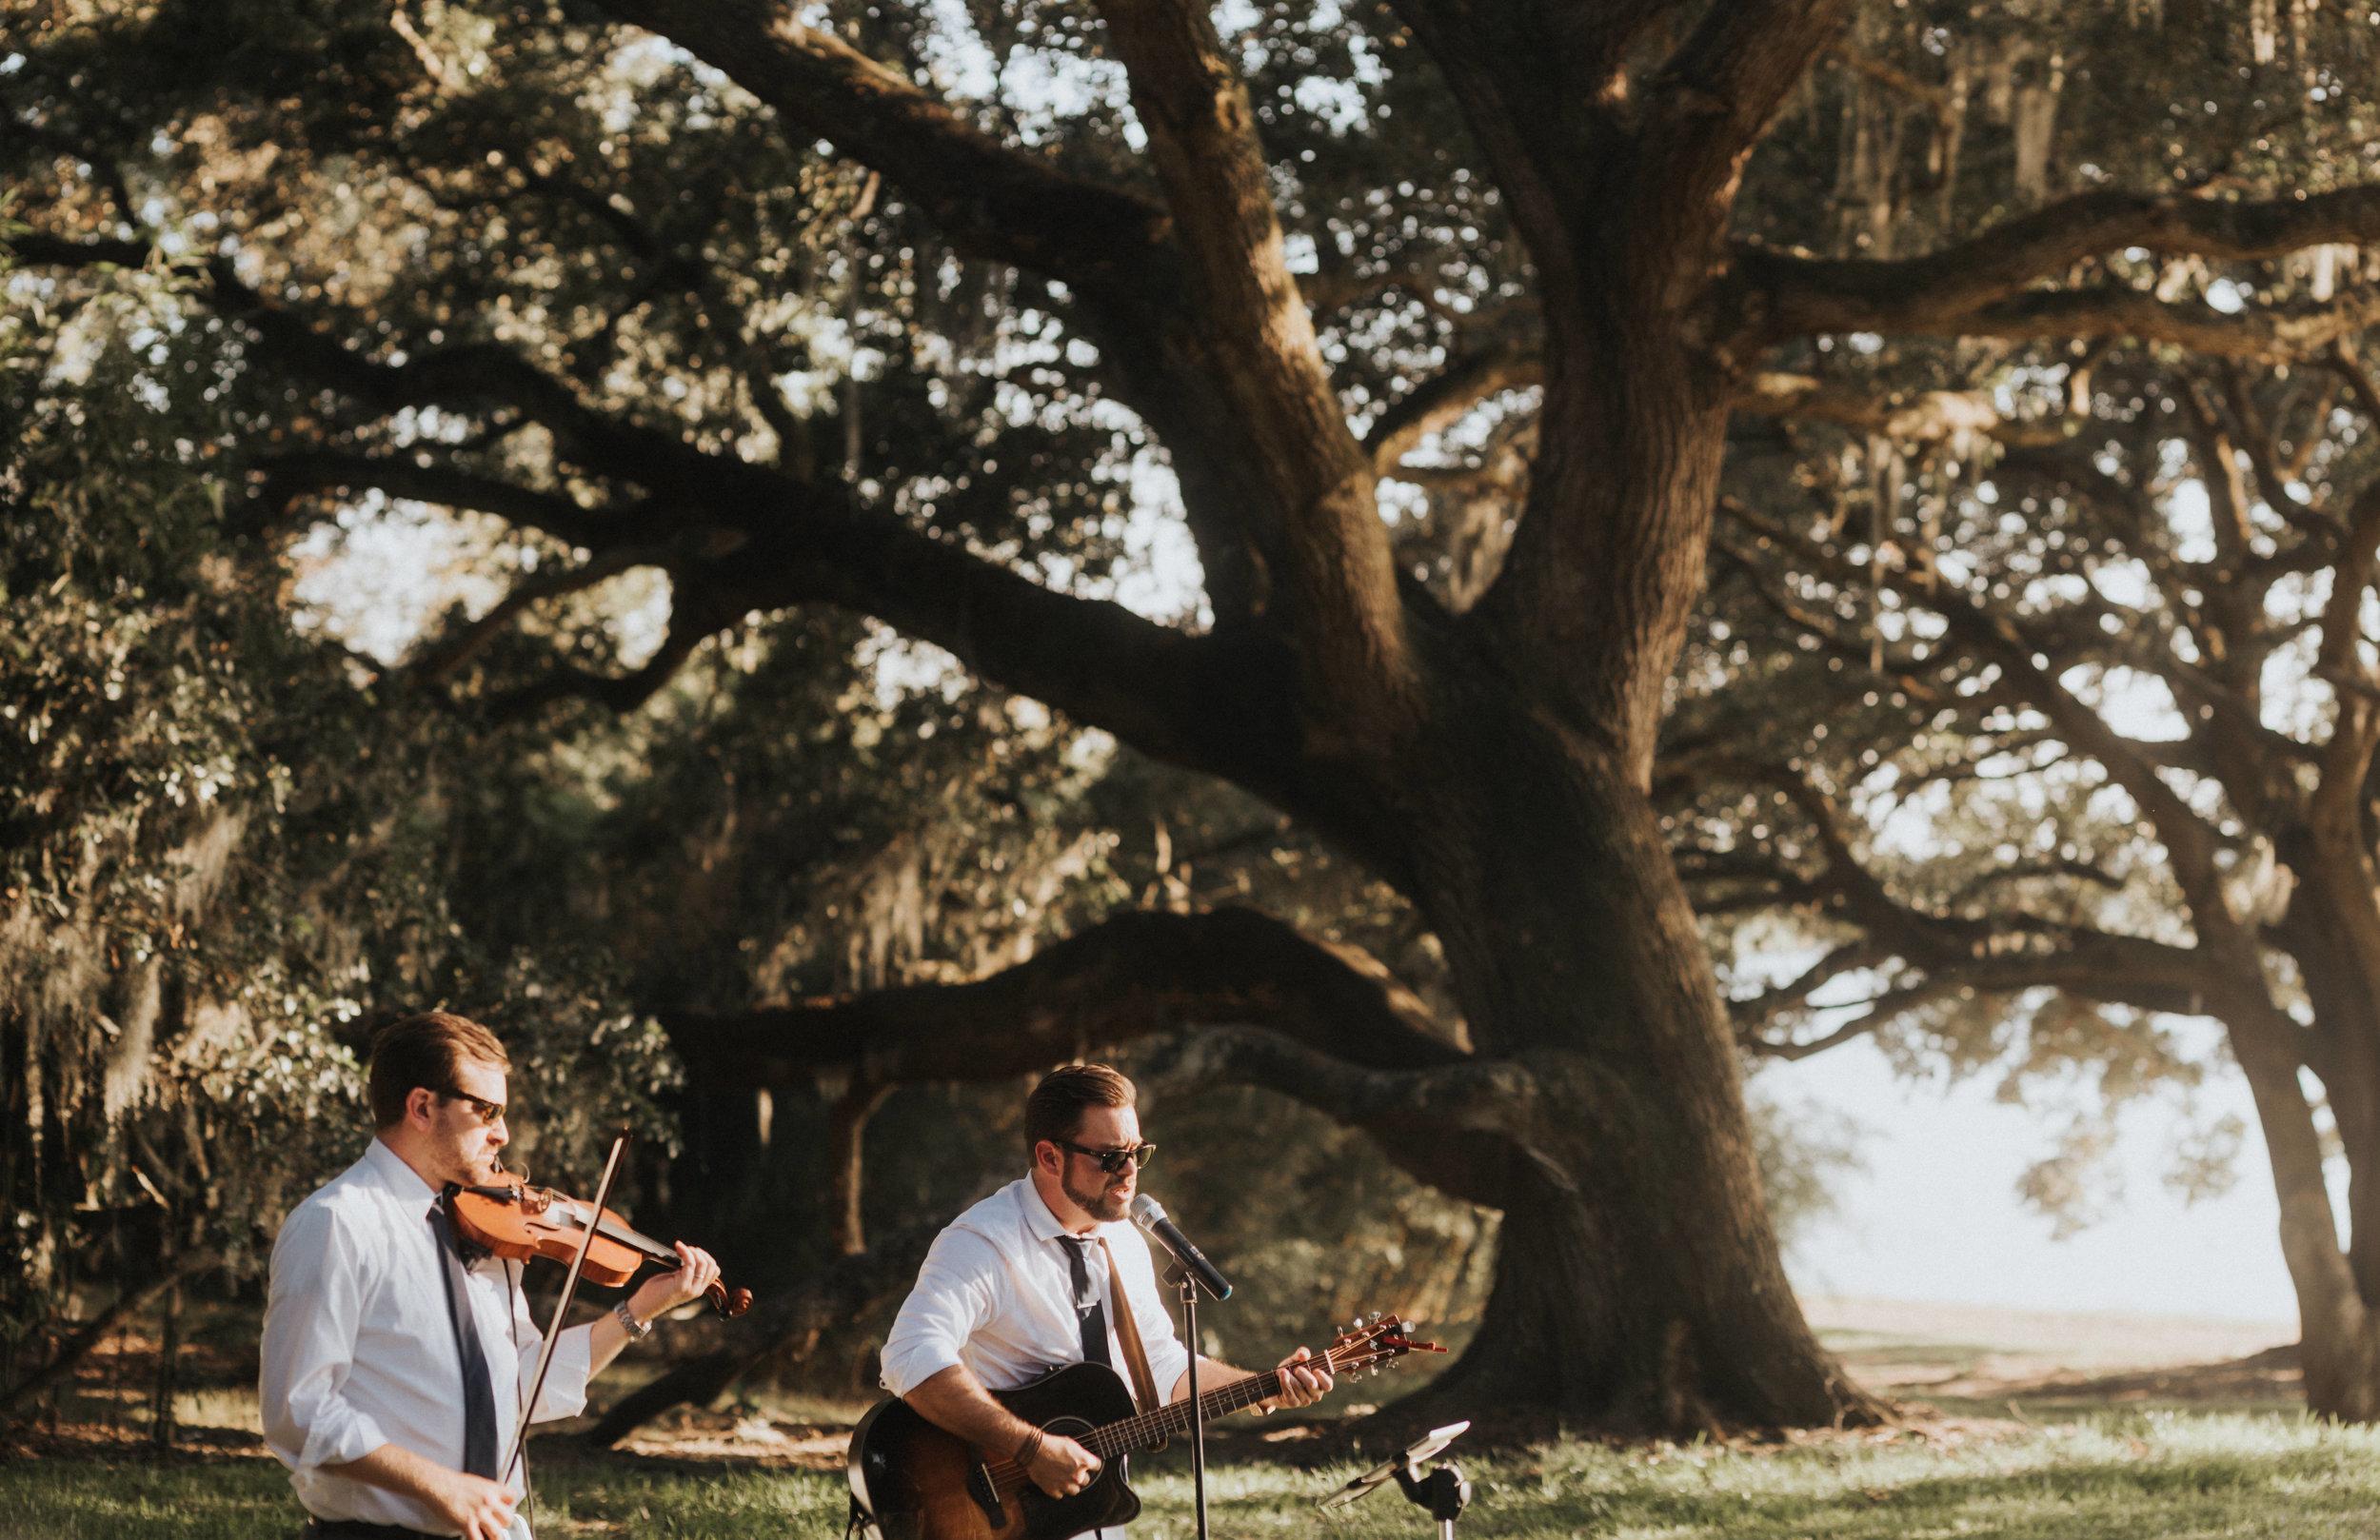 Southern Fete, Southern Wedding, Band, Outside Wedding